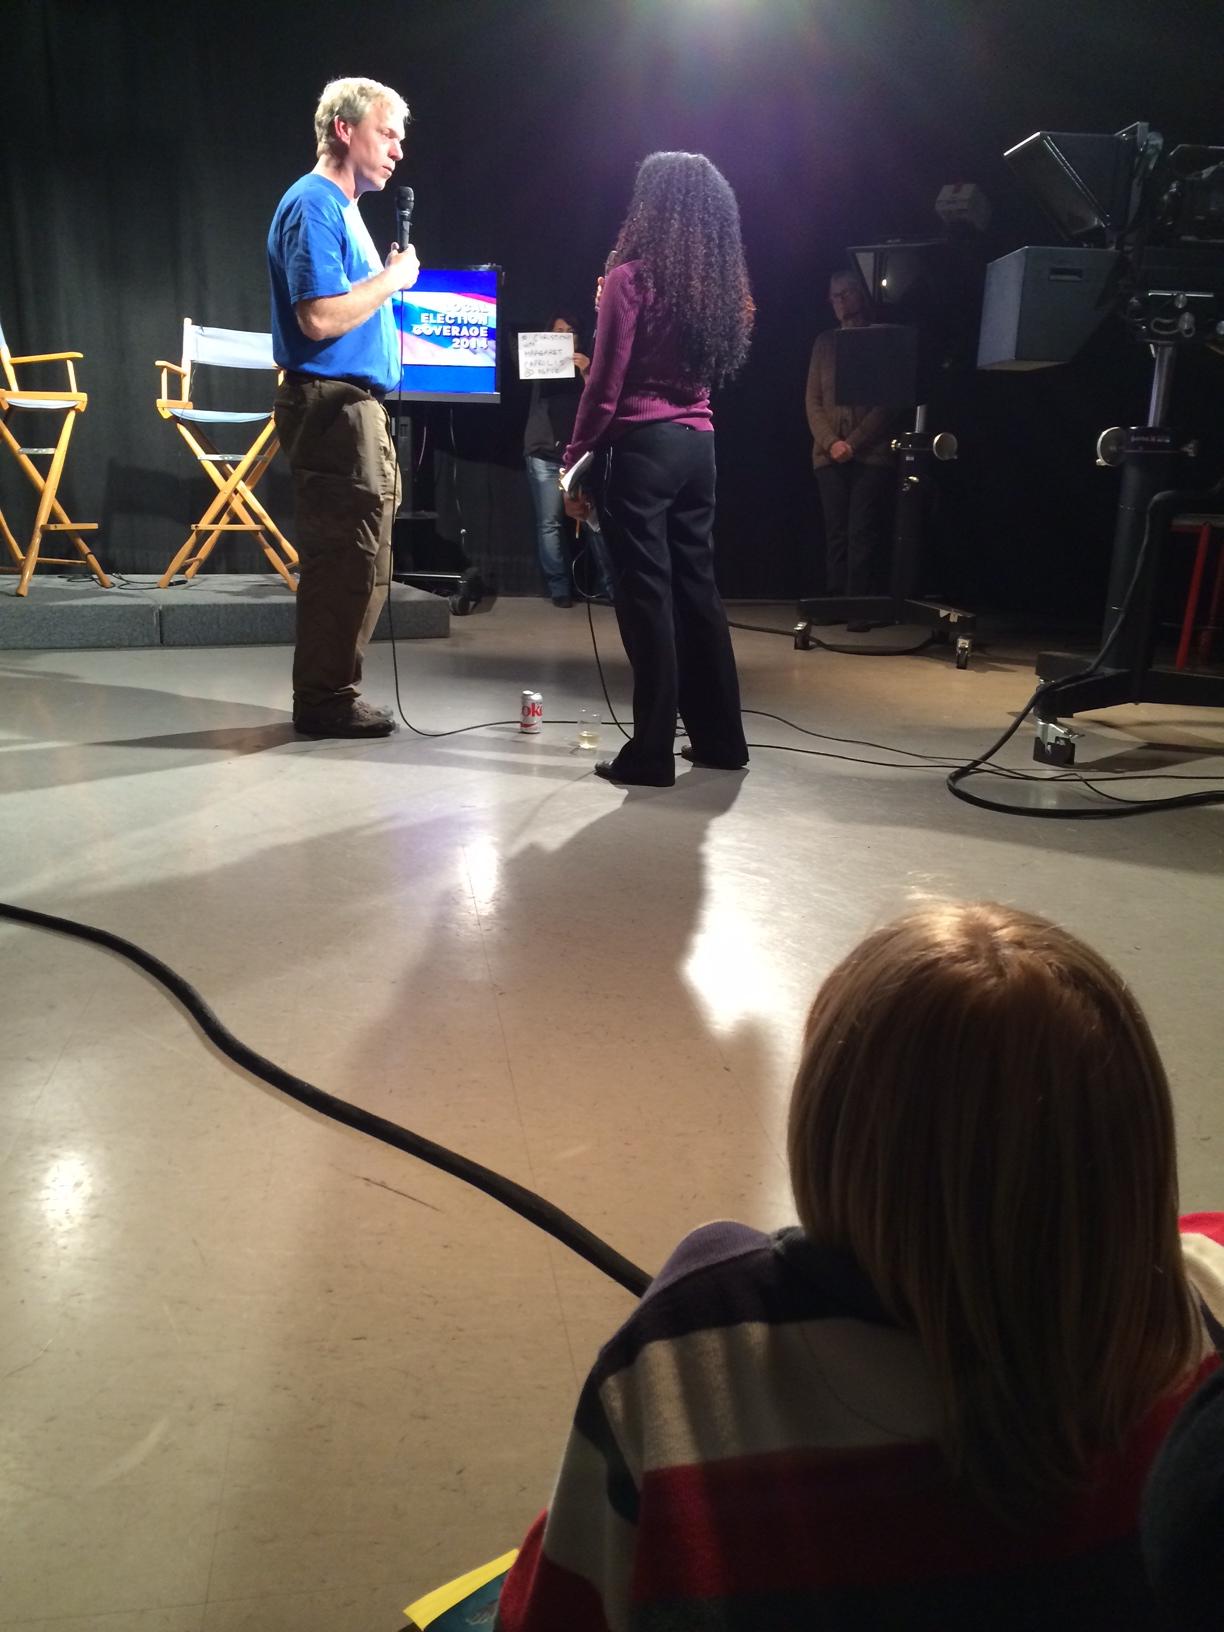 Elliot watches Brian Schmidt interviewed on election night at KMTV.